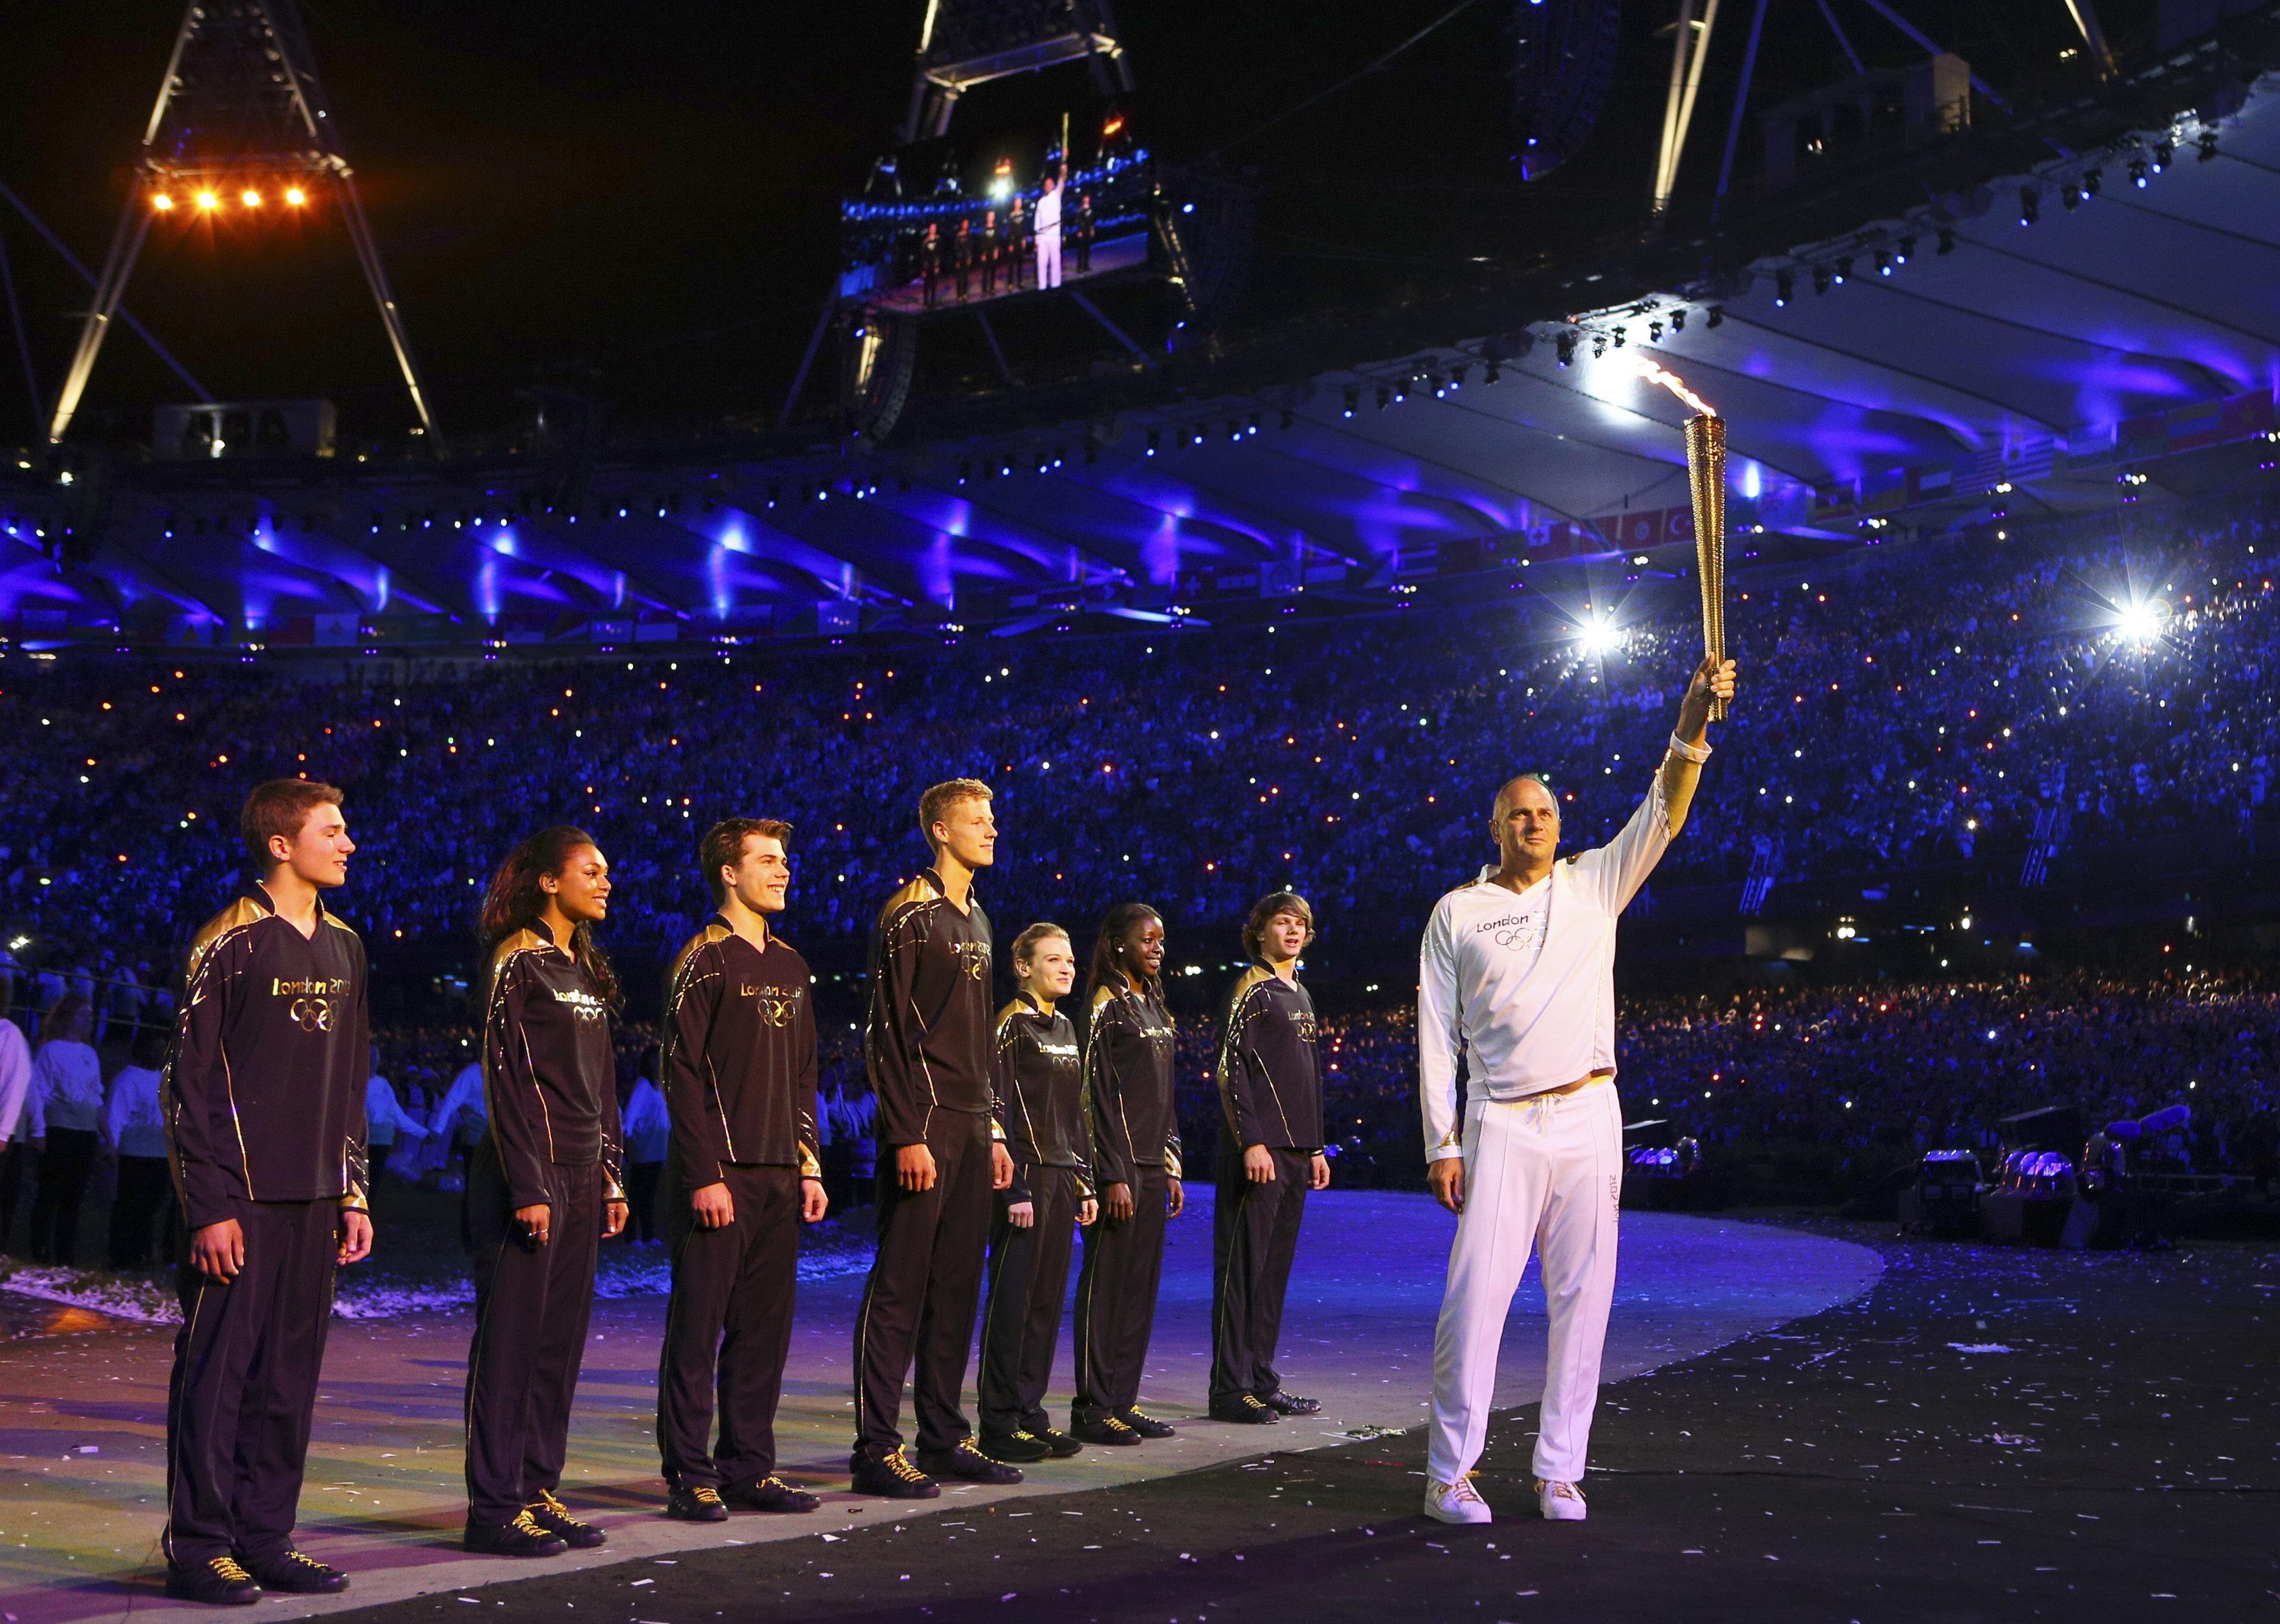 london-olympics-opening-ceremony-21721269jpg 3,865×2,753 pixels